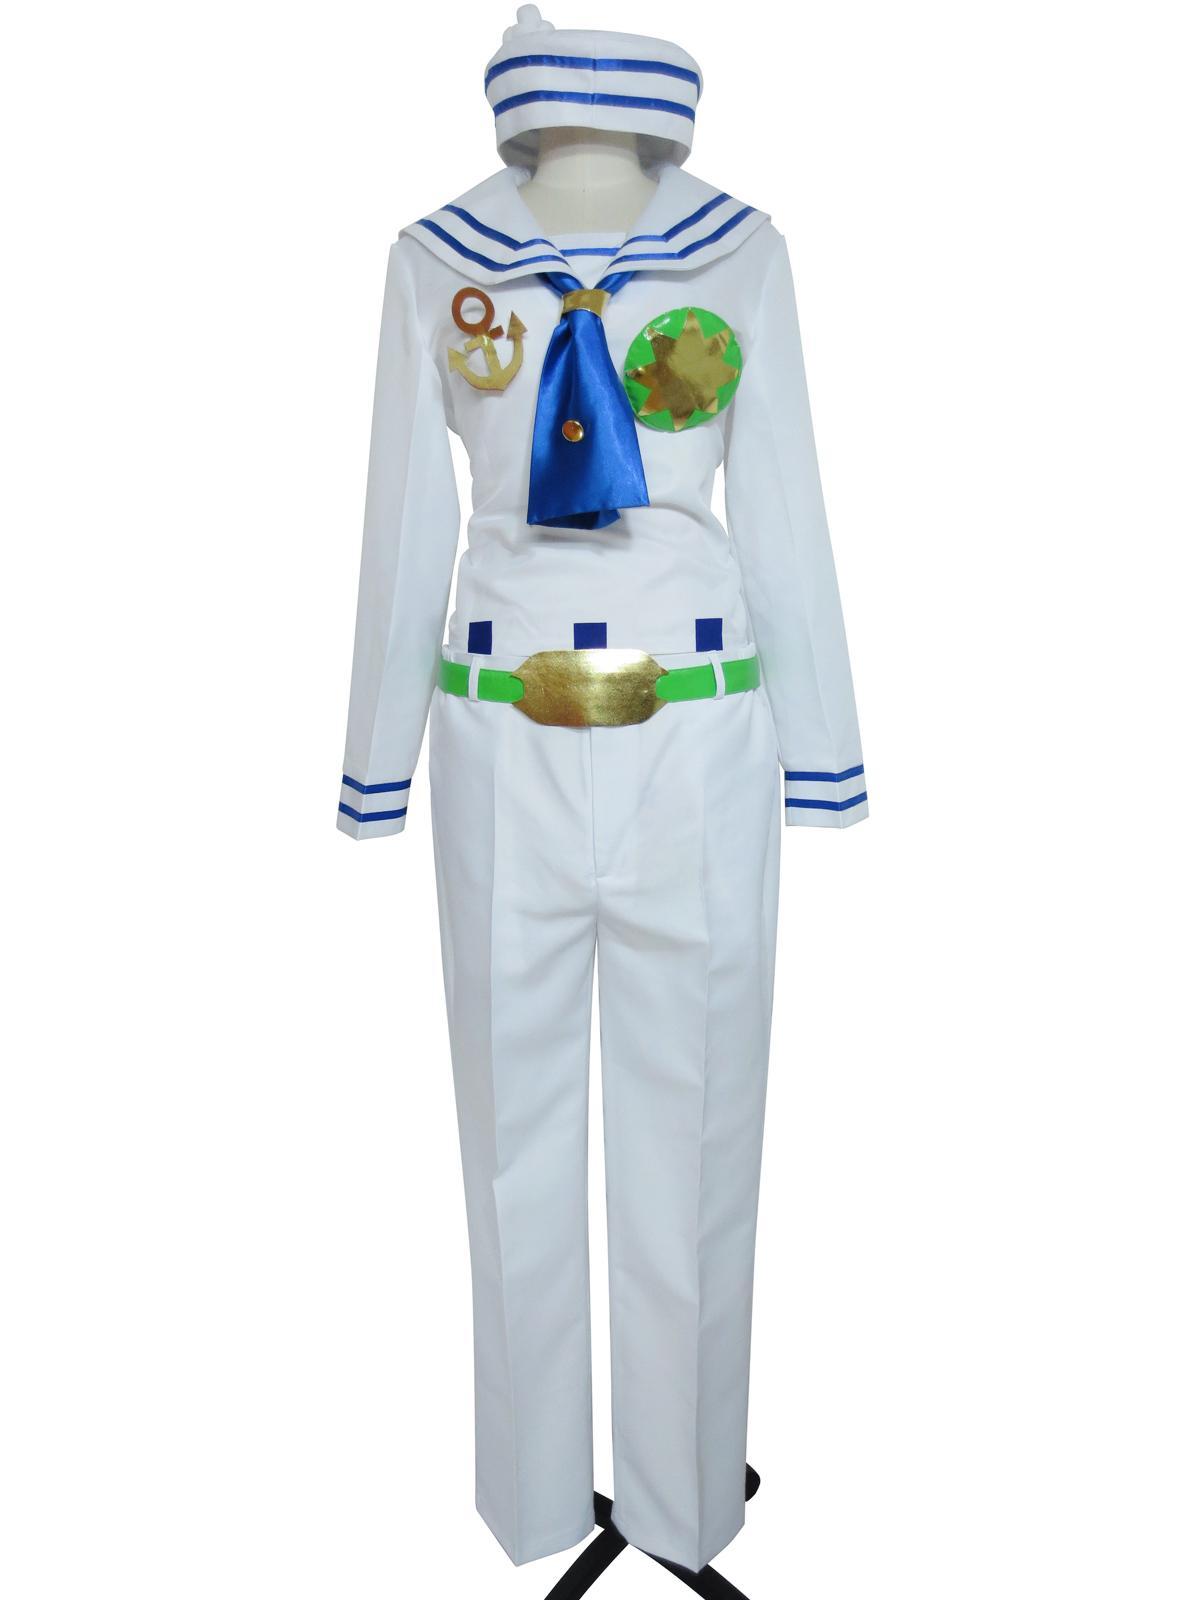 Jojos Bizarre Adventure Josuke Higashikata Halloween White Sailor Uniform Cosplay Costume Anime Cosplay Mask Cartoon Cosplay Costumes From Lisacosplay 69 04 Dhgate Com